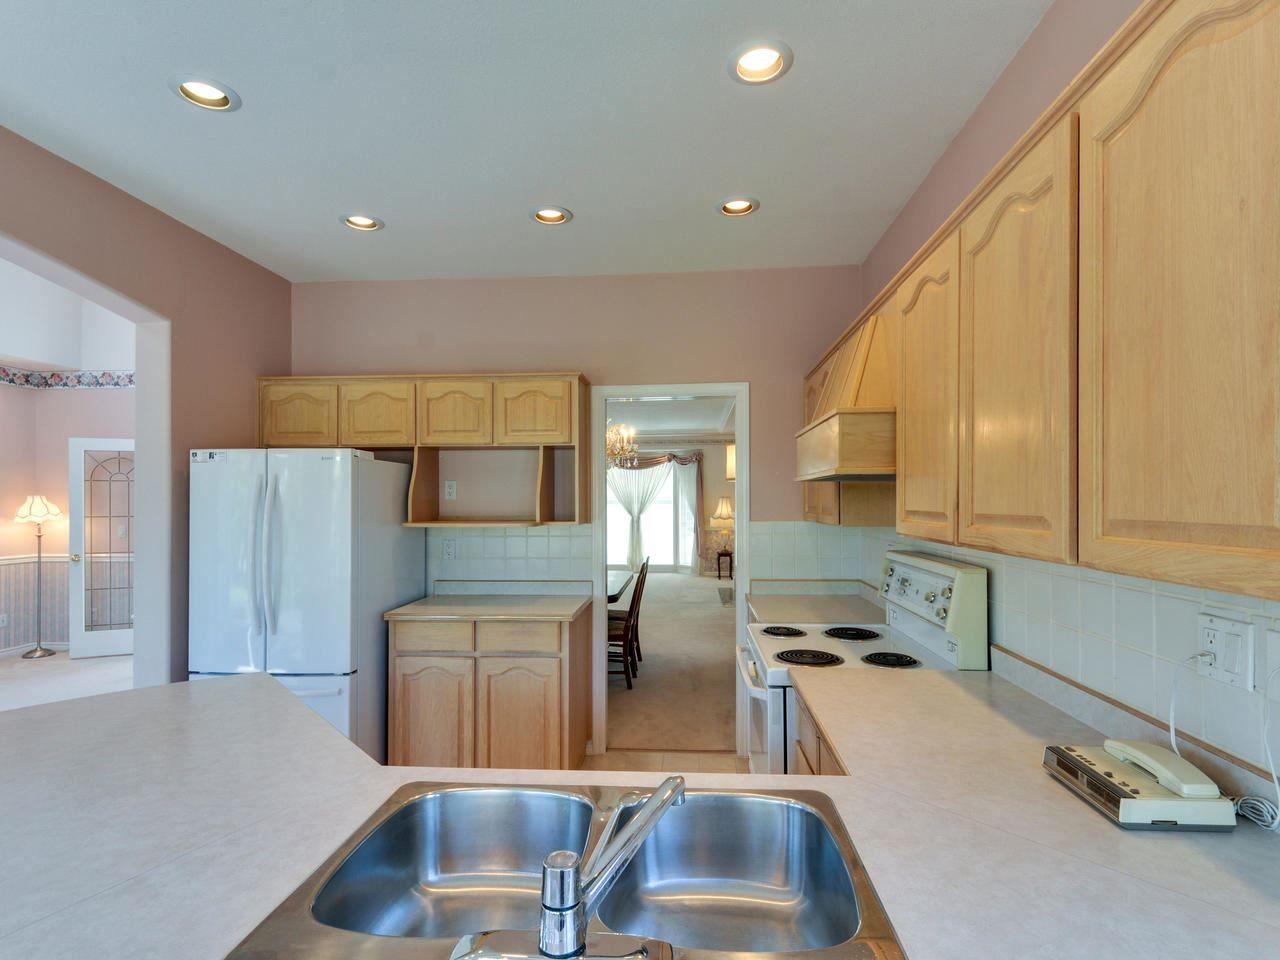 "Photo 7: Photos: 14923 24A Avenue in Surrey: Sunnyside Park Surrey House for sale in ""Sherborrke Estates"" (South Surrey White Rock)  : MLS®# R2374300"